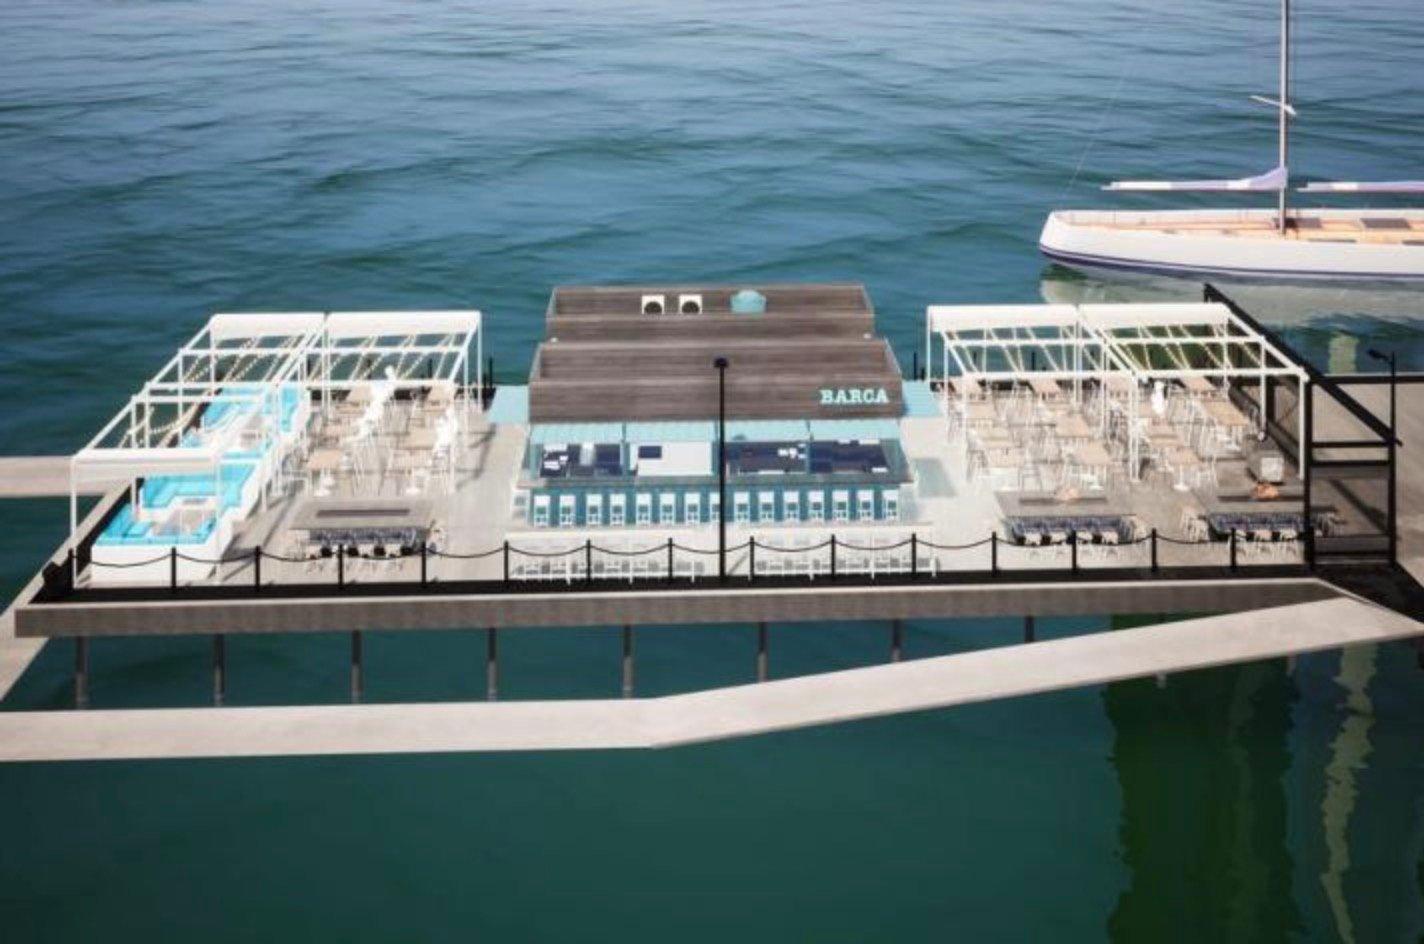 waterfront-dining-potomac-river-alexandria-barca